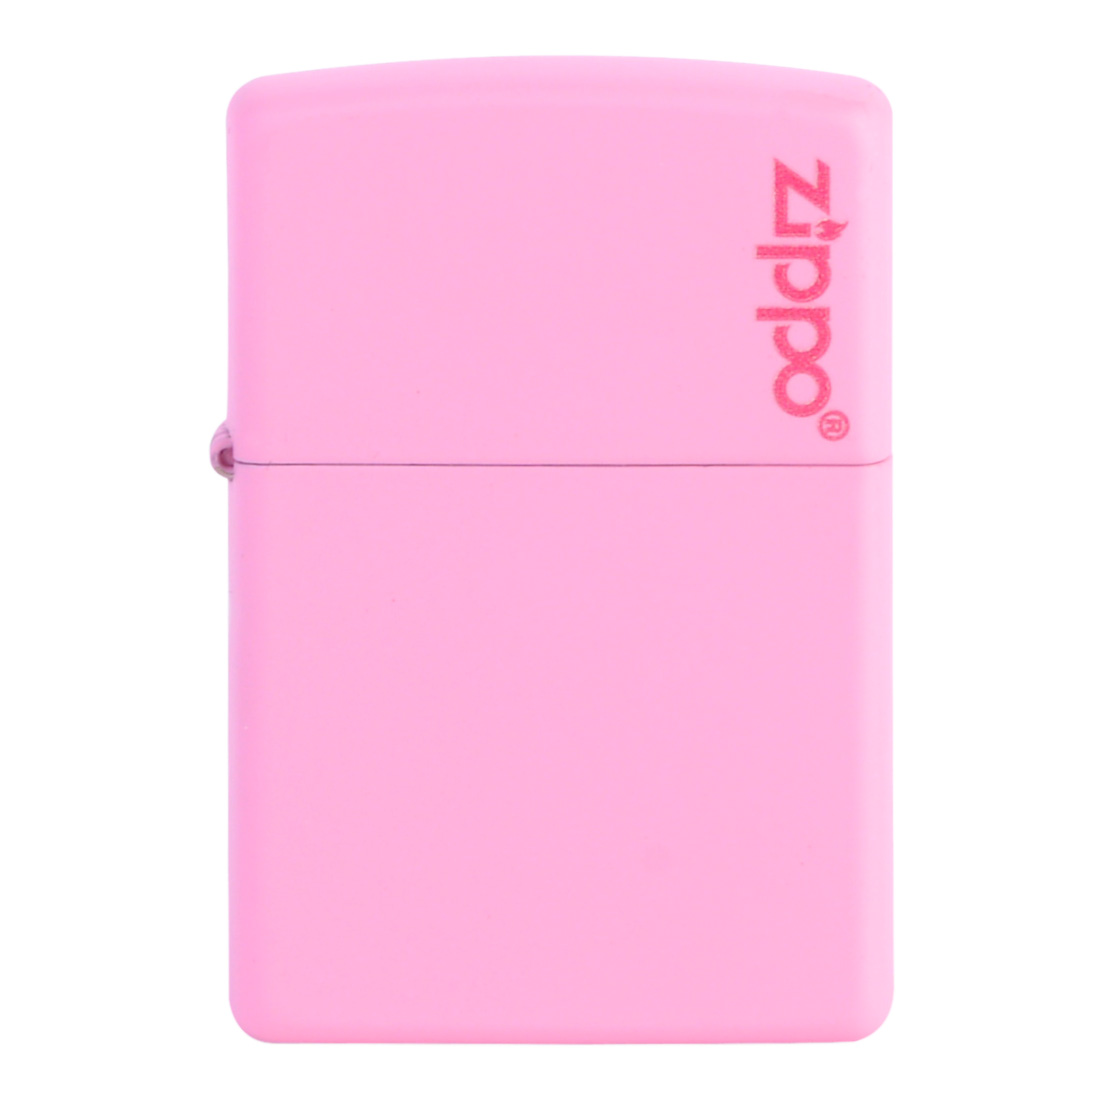 zippo rose